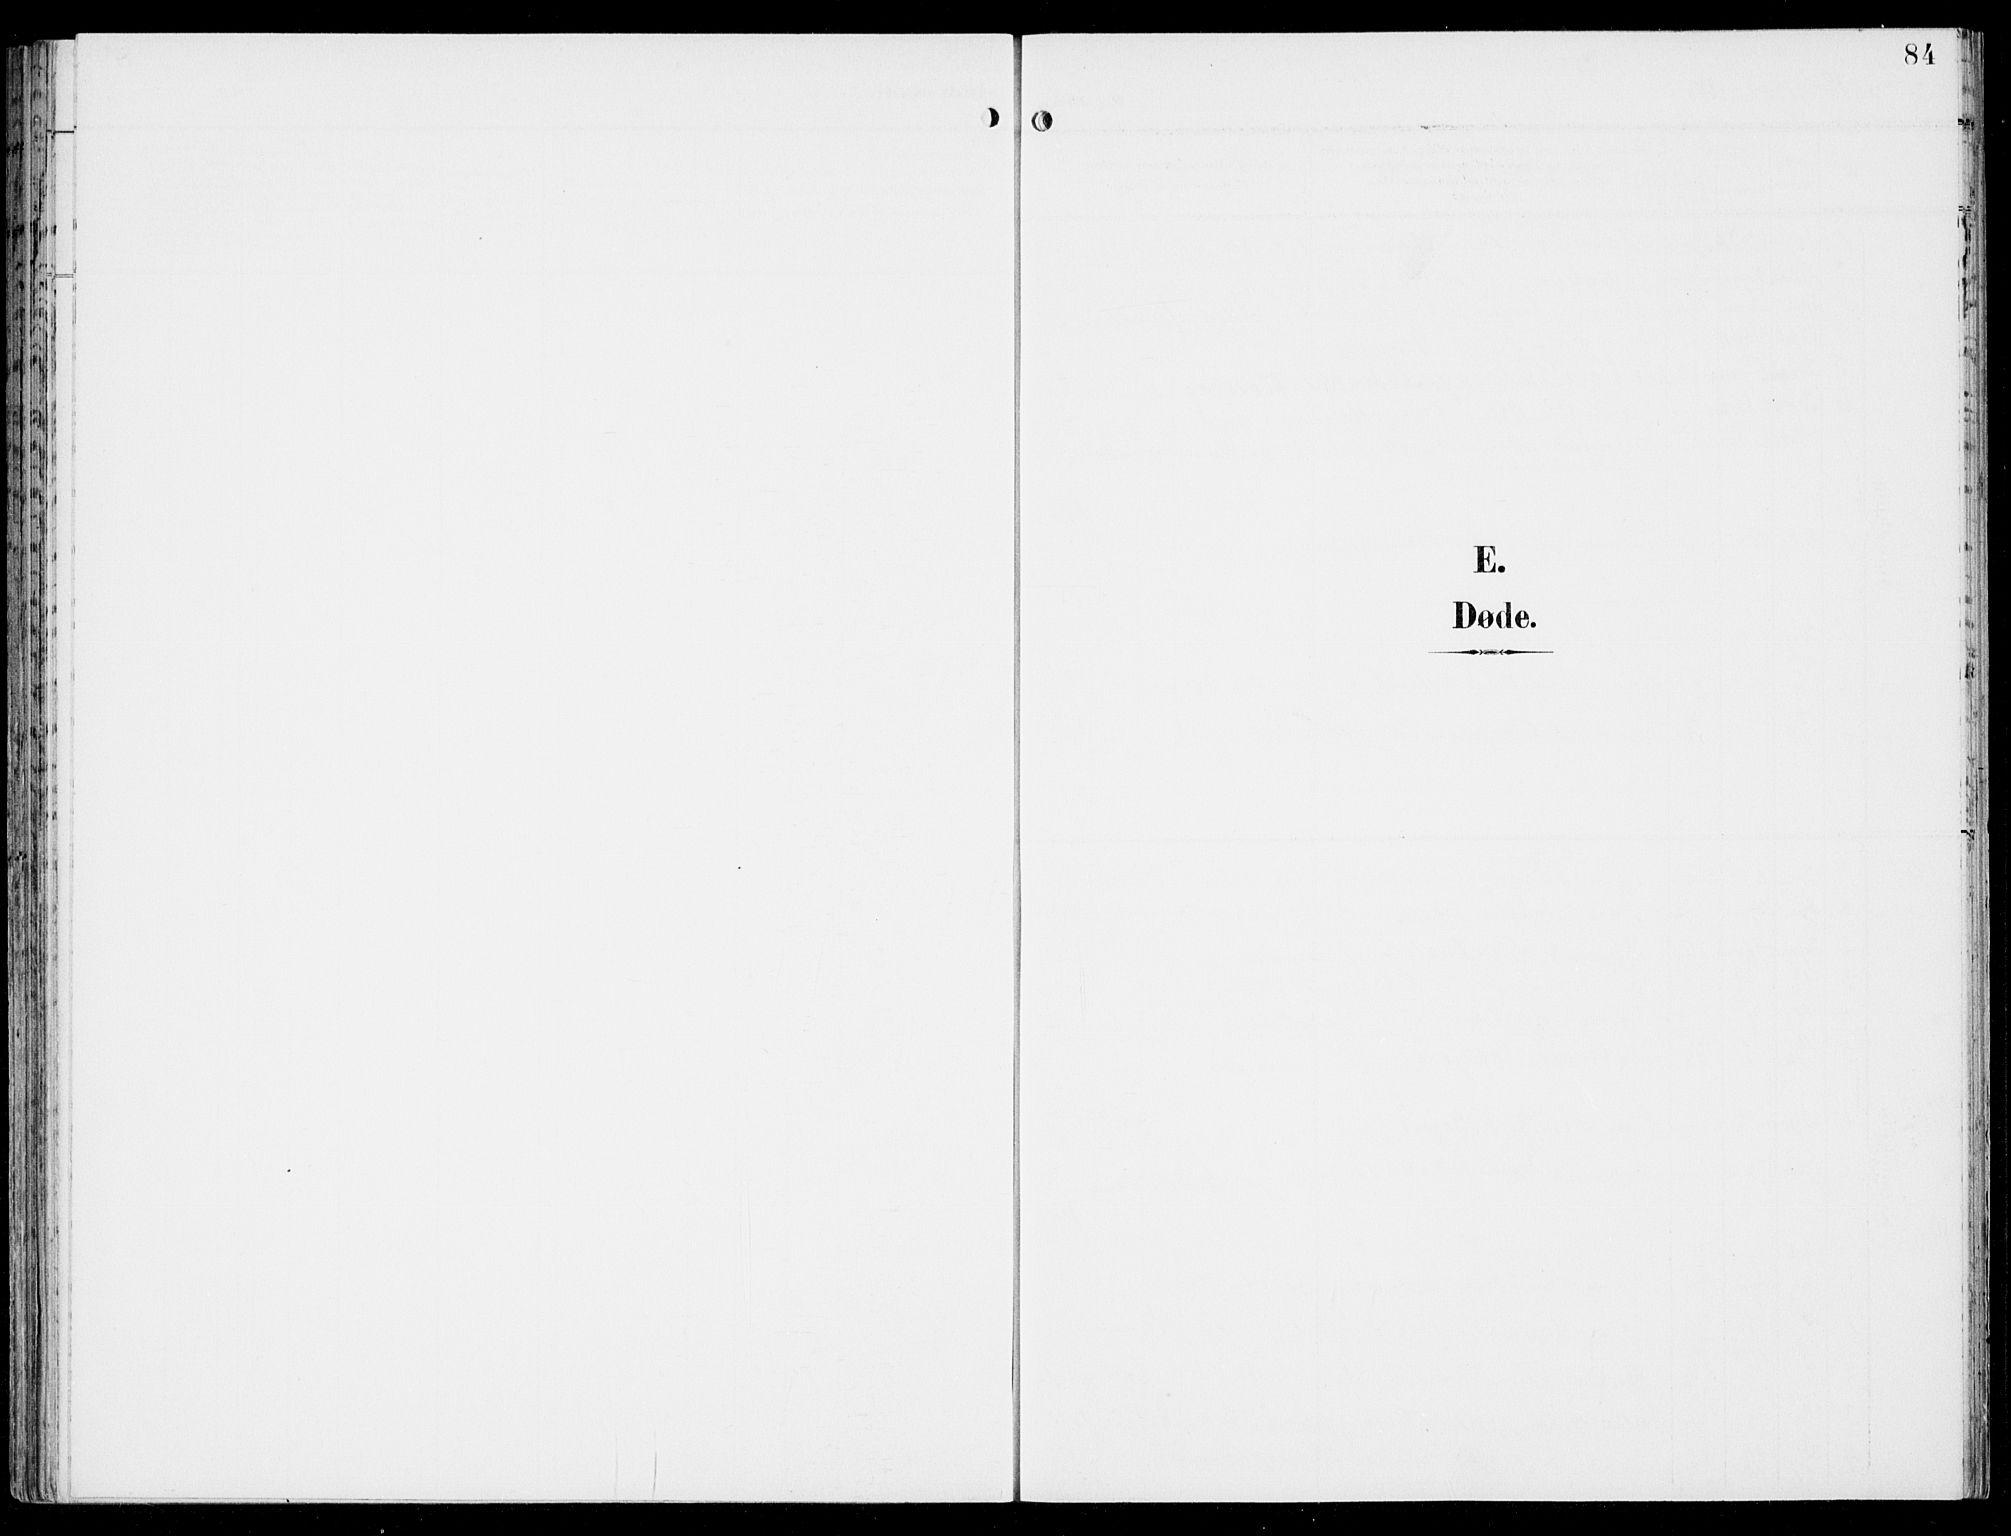 SAB, Hosanger sokneprestembete, H/Haa: Ministerialbok nr. C  2, 1901-1925, s. 84